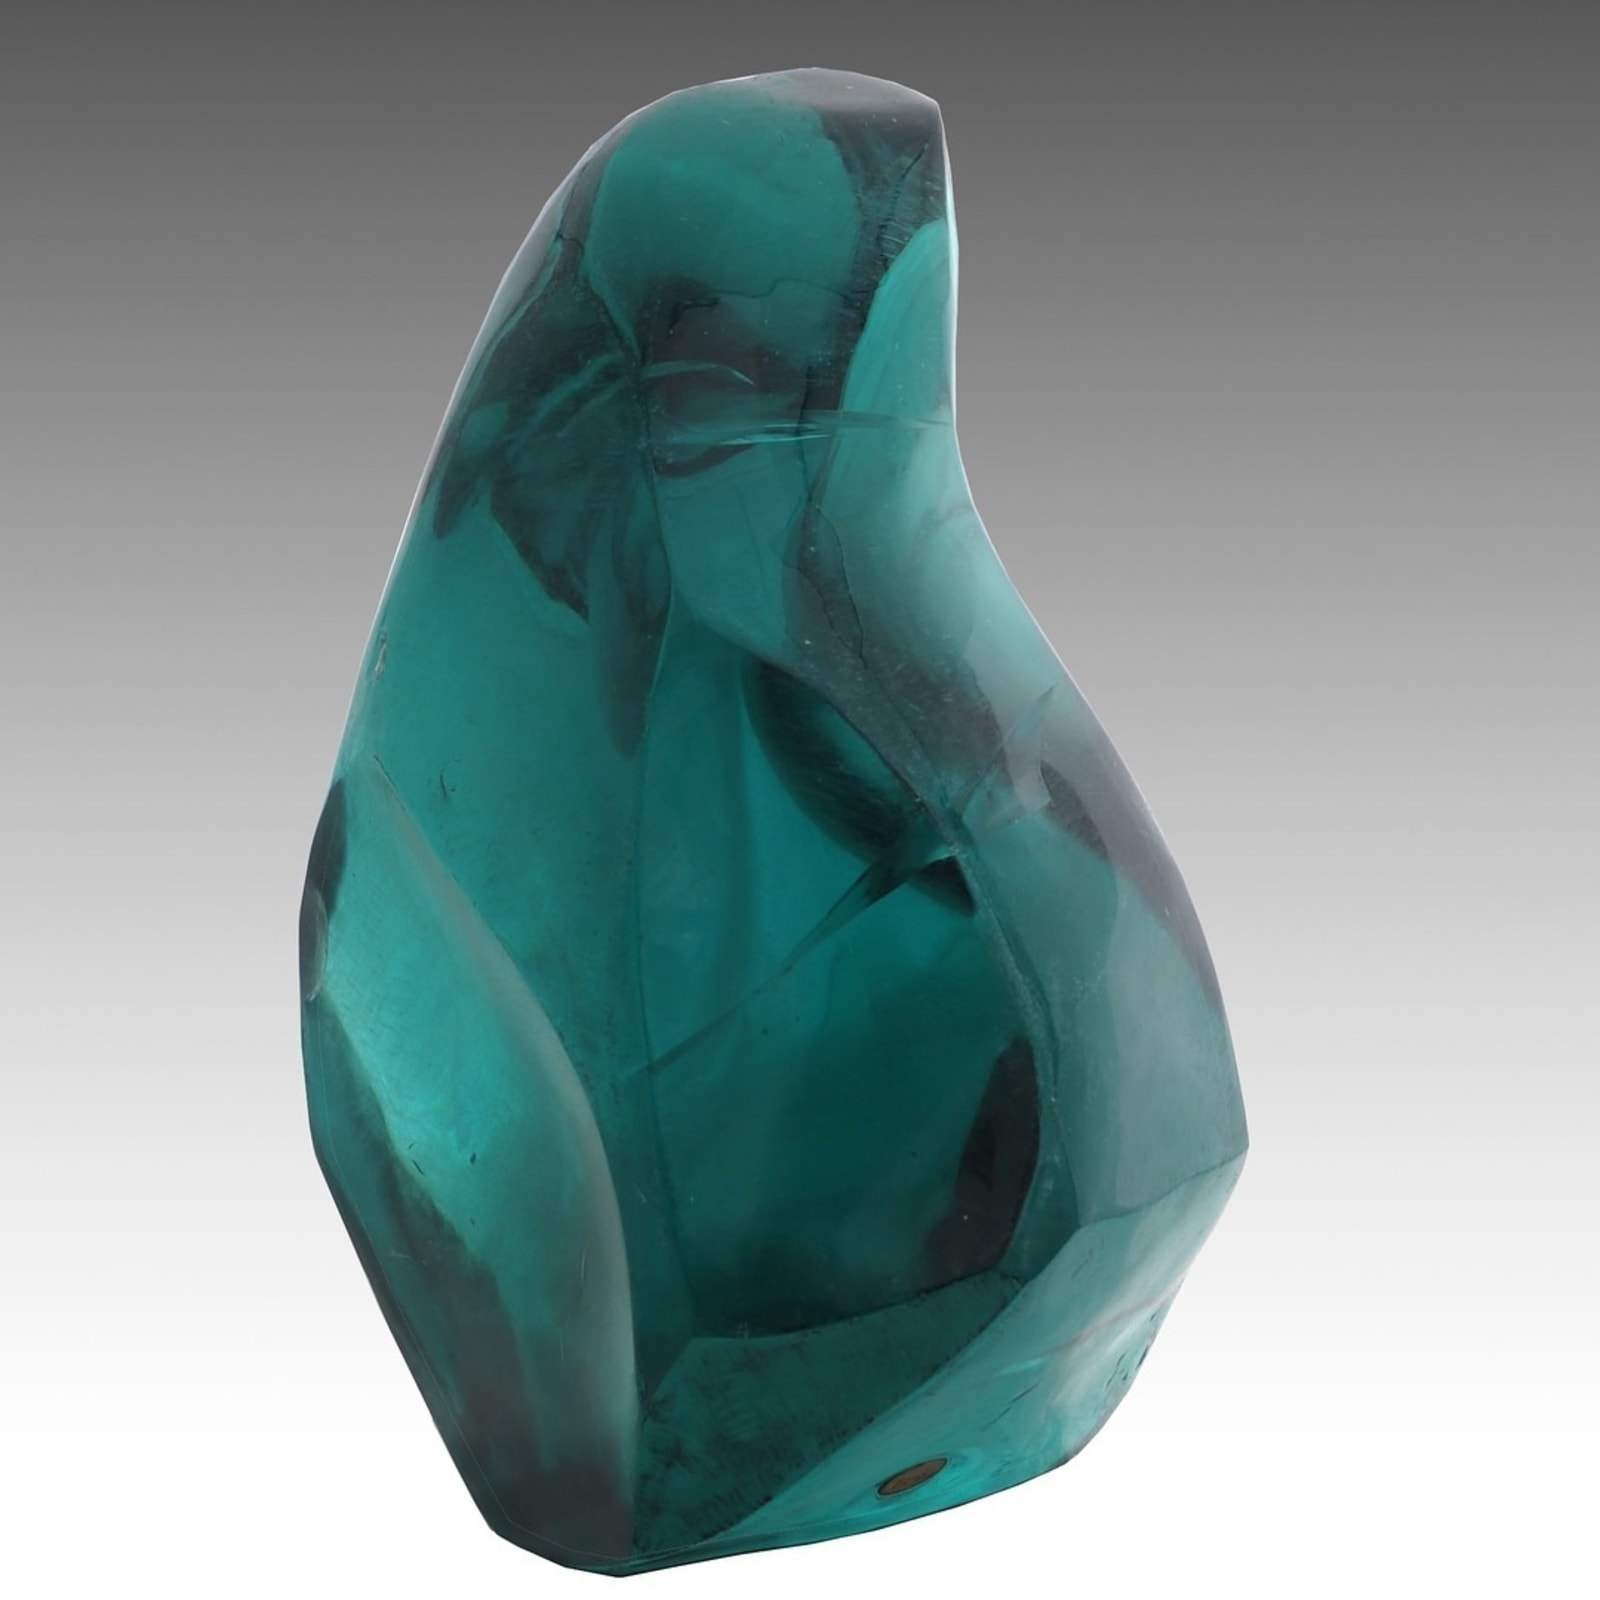 Jamal Al Yousef Village Lady, 40x31x55cm, Hand sculpted glass, 2018